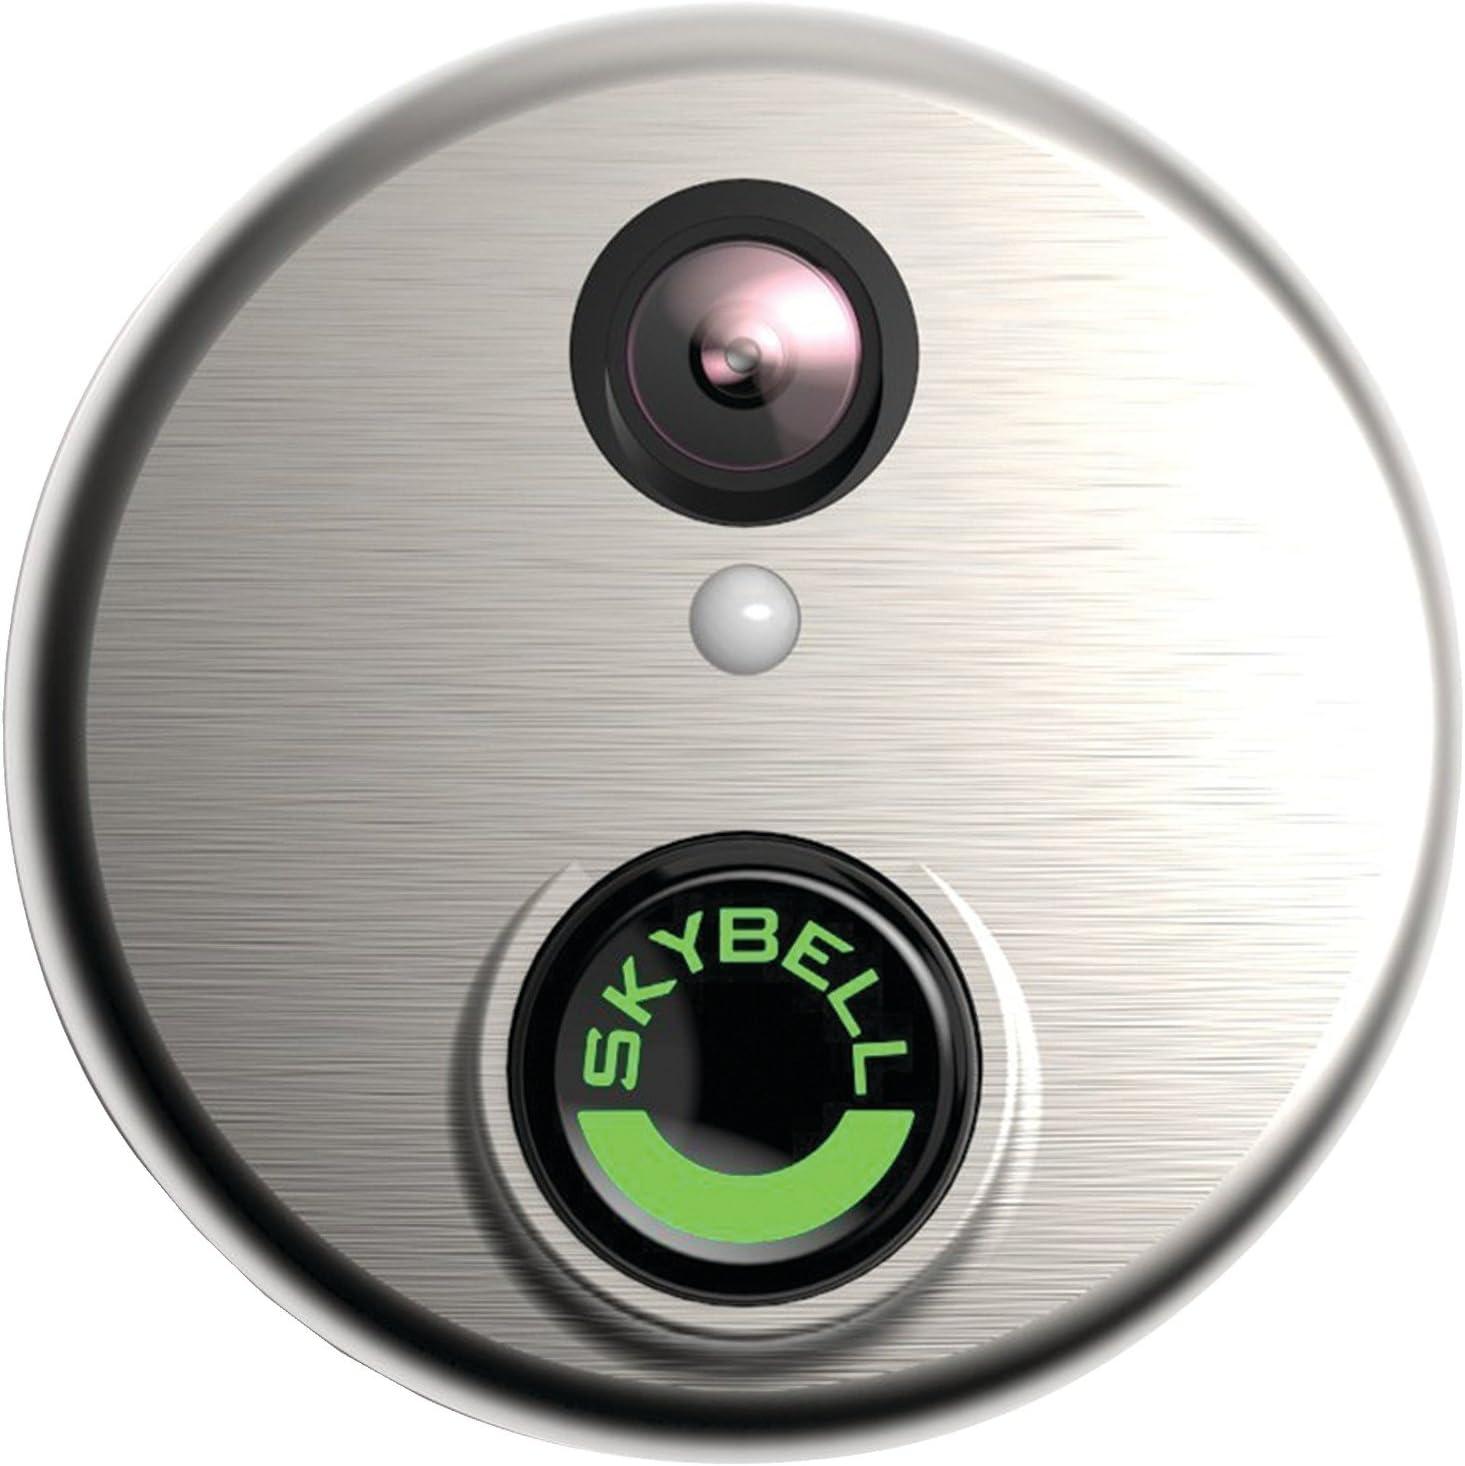 SkyBell SH02300SL HD WiFi Video Doorbell